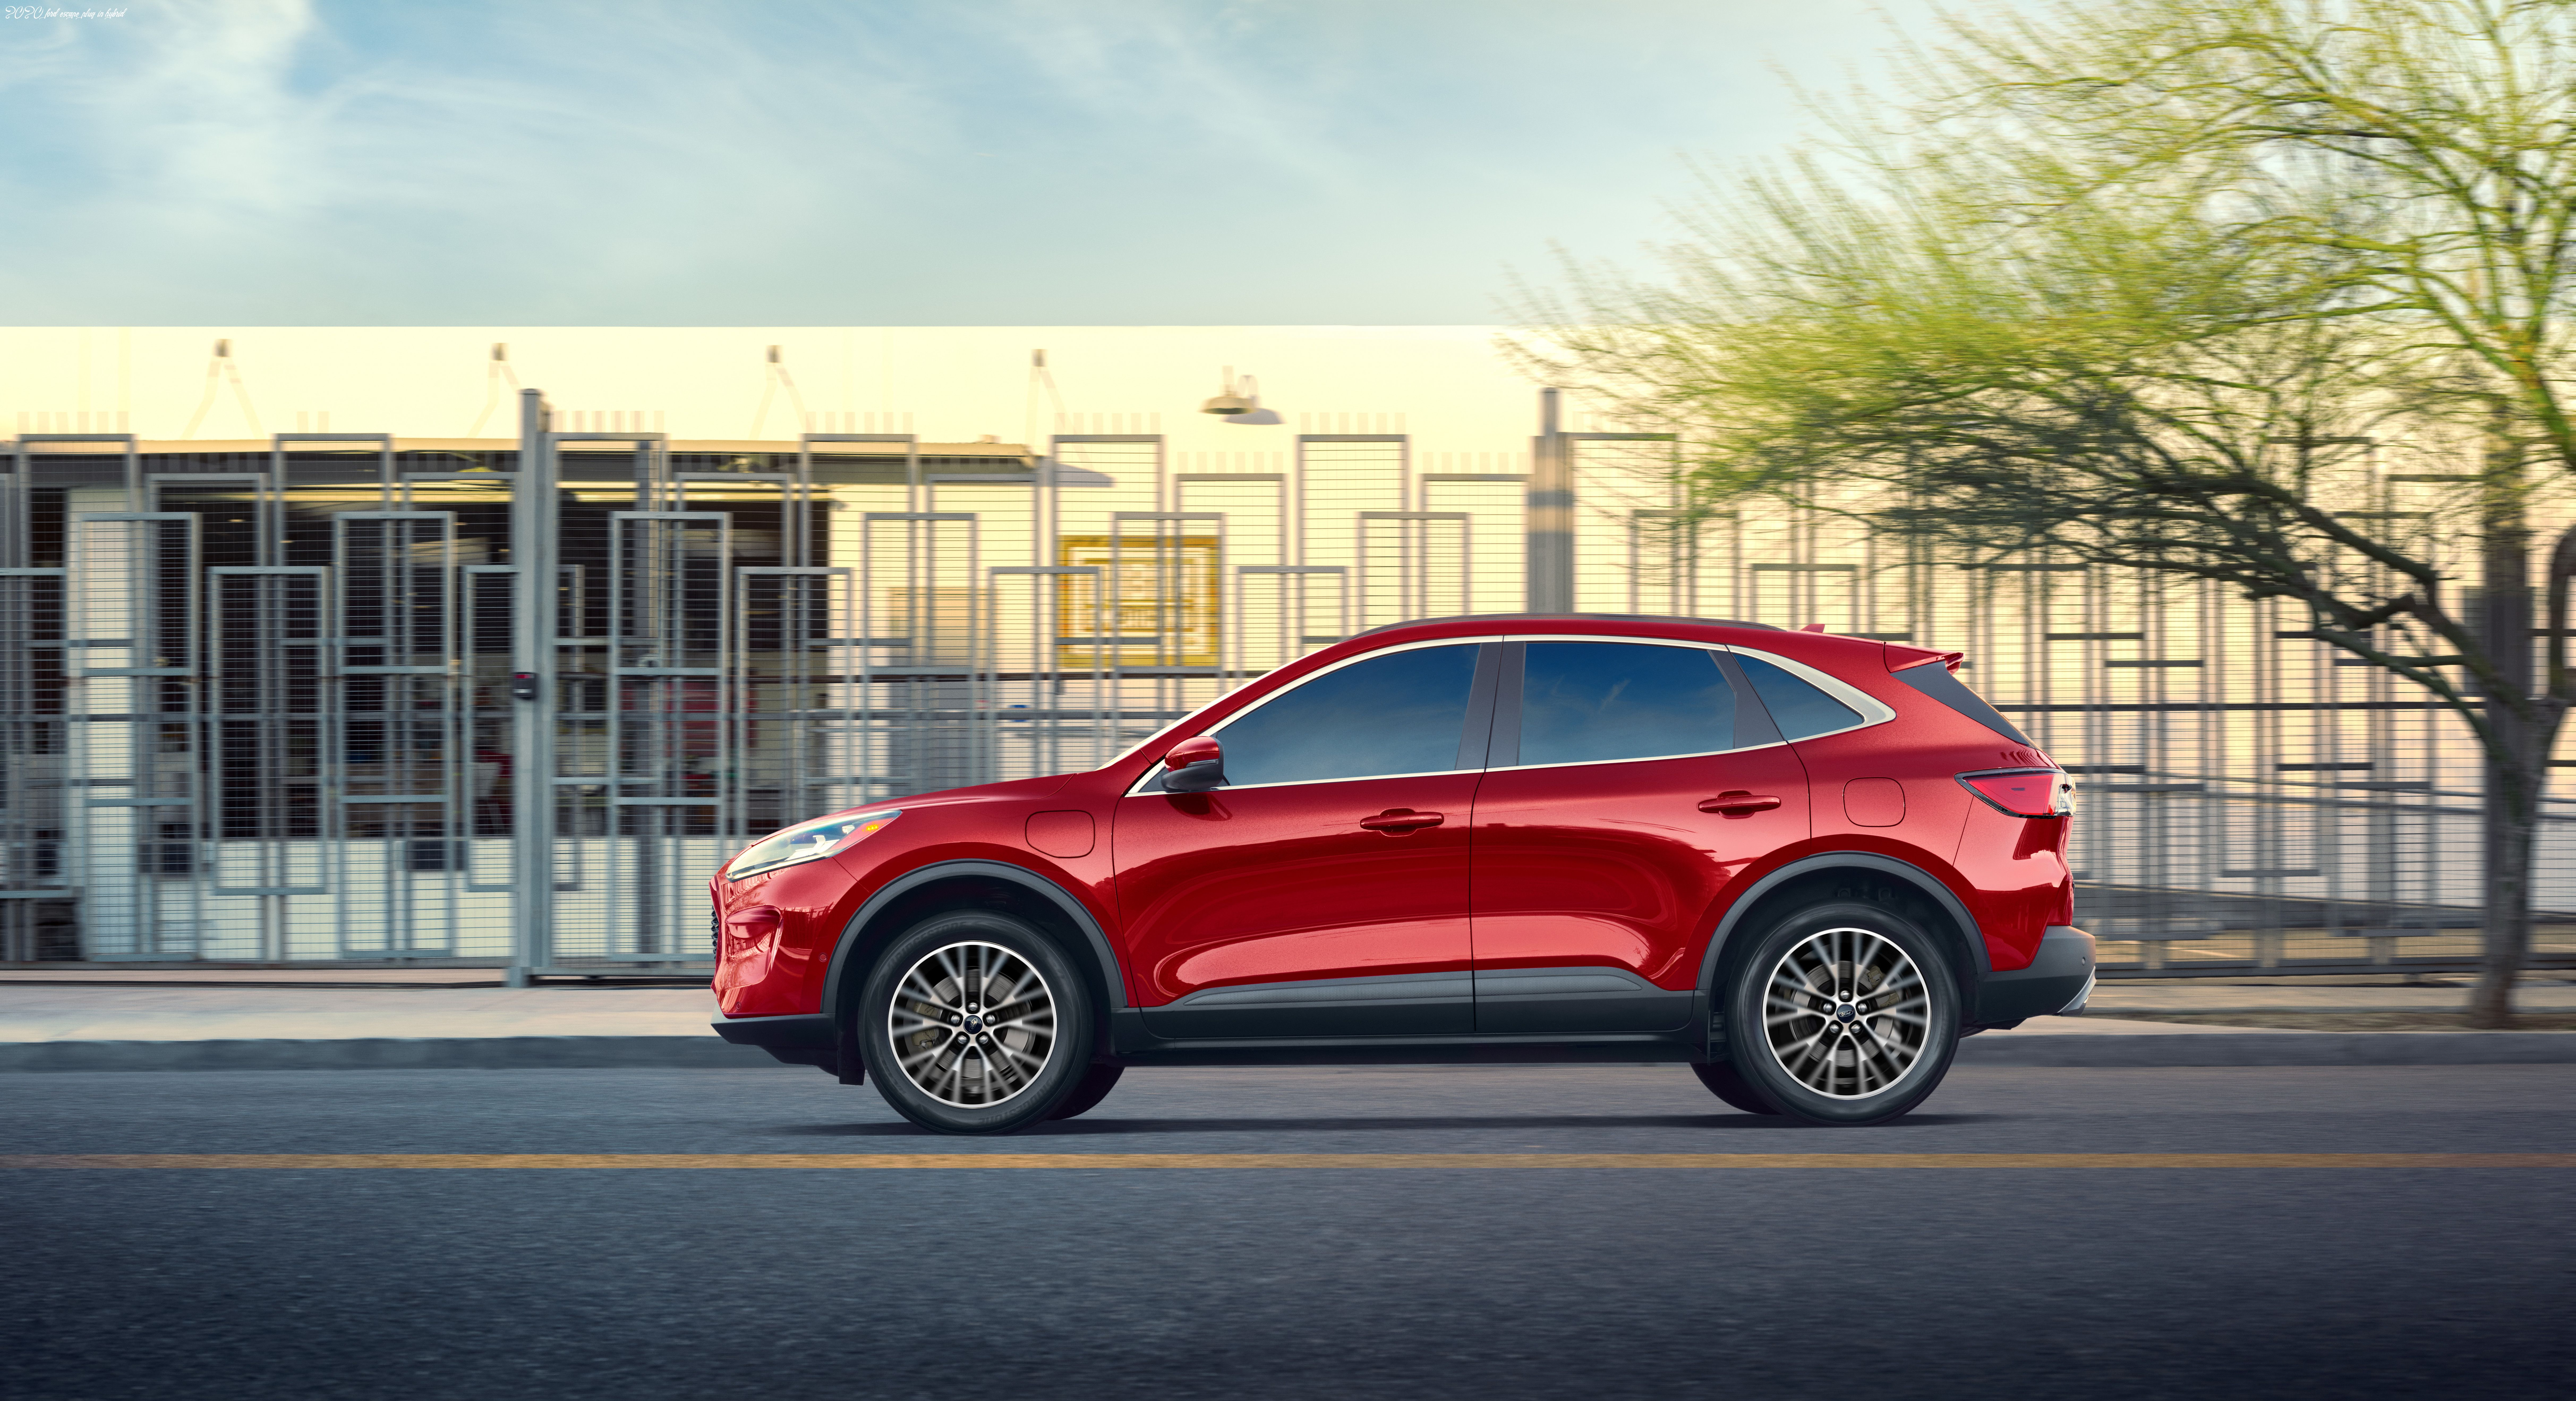 2020 Ford Escape Plug In Hybrid In 2020 Ford Escape Hybrid Car Suv